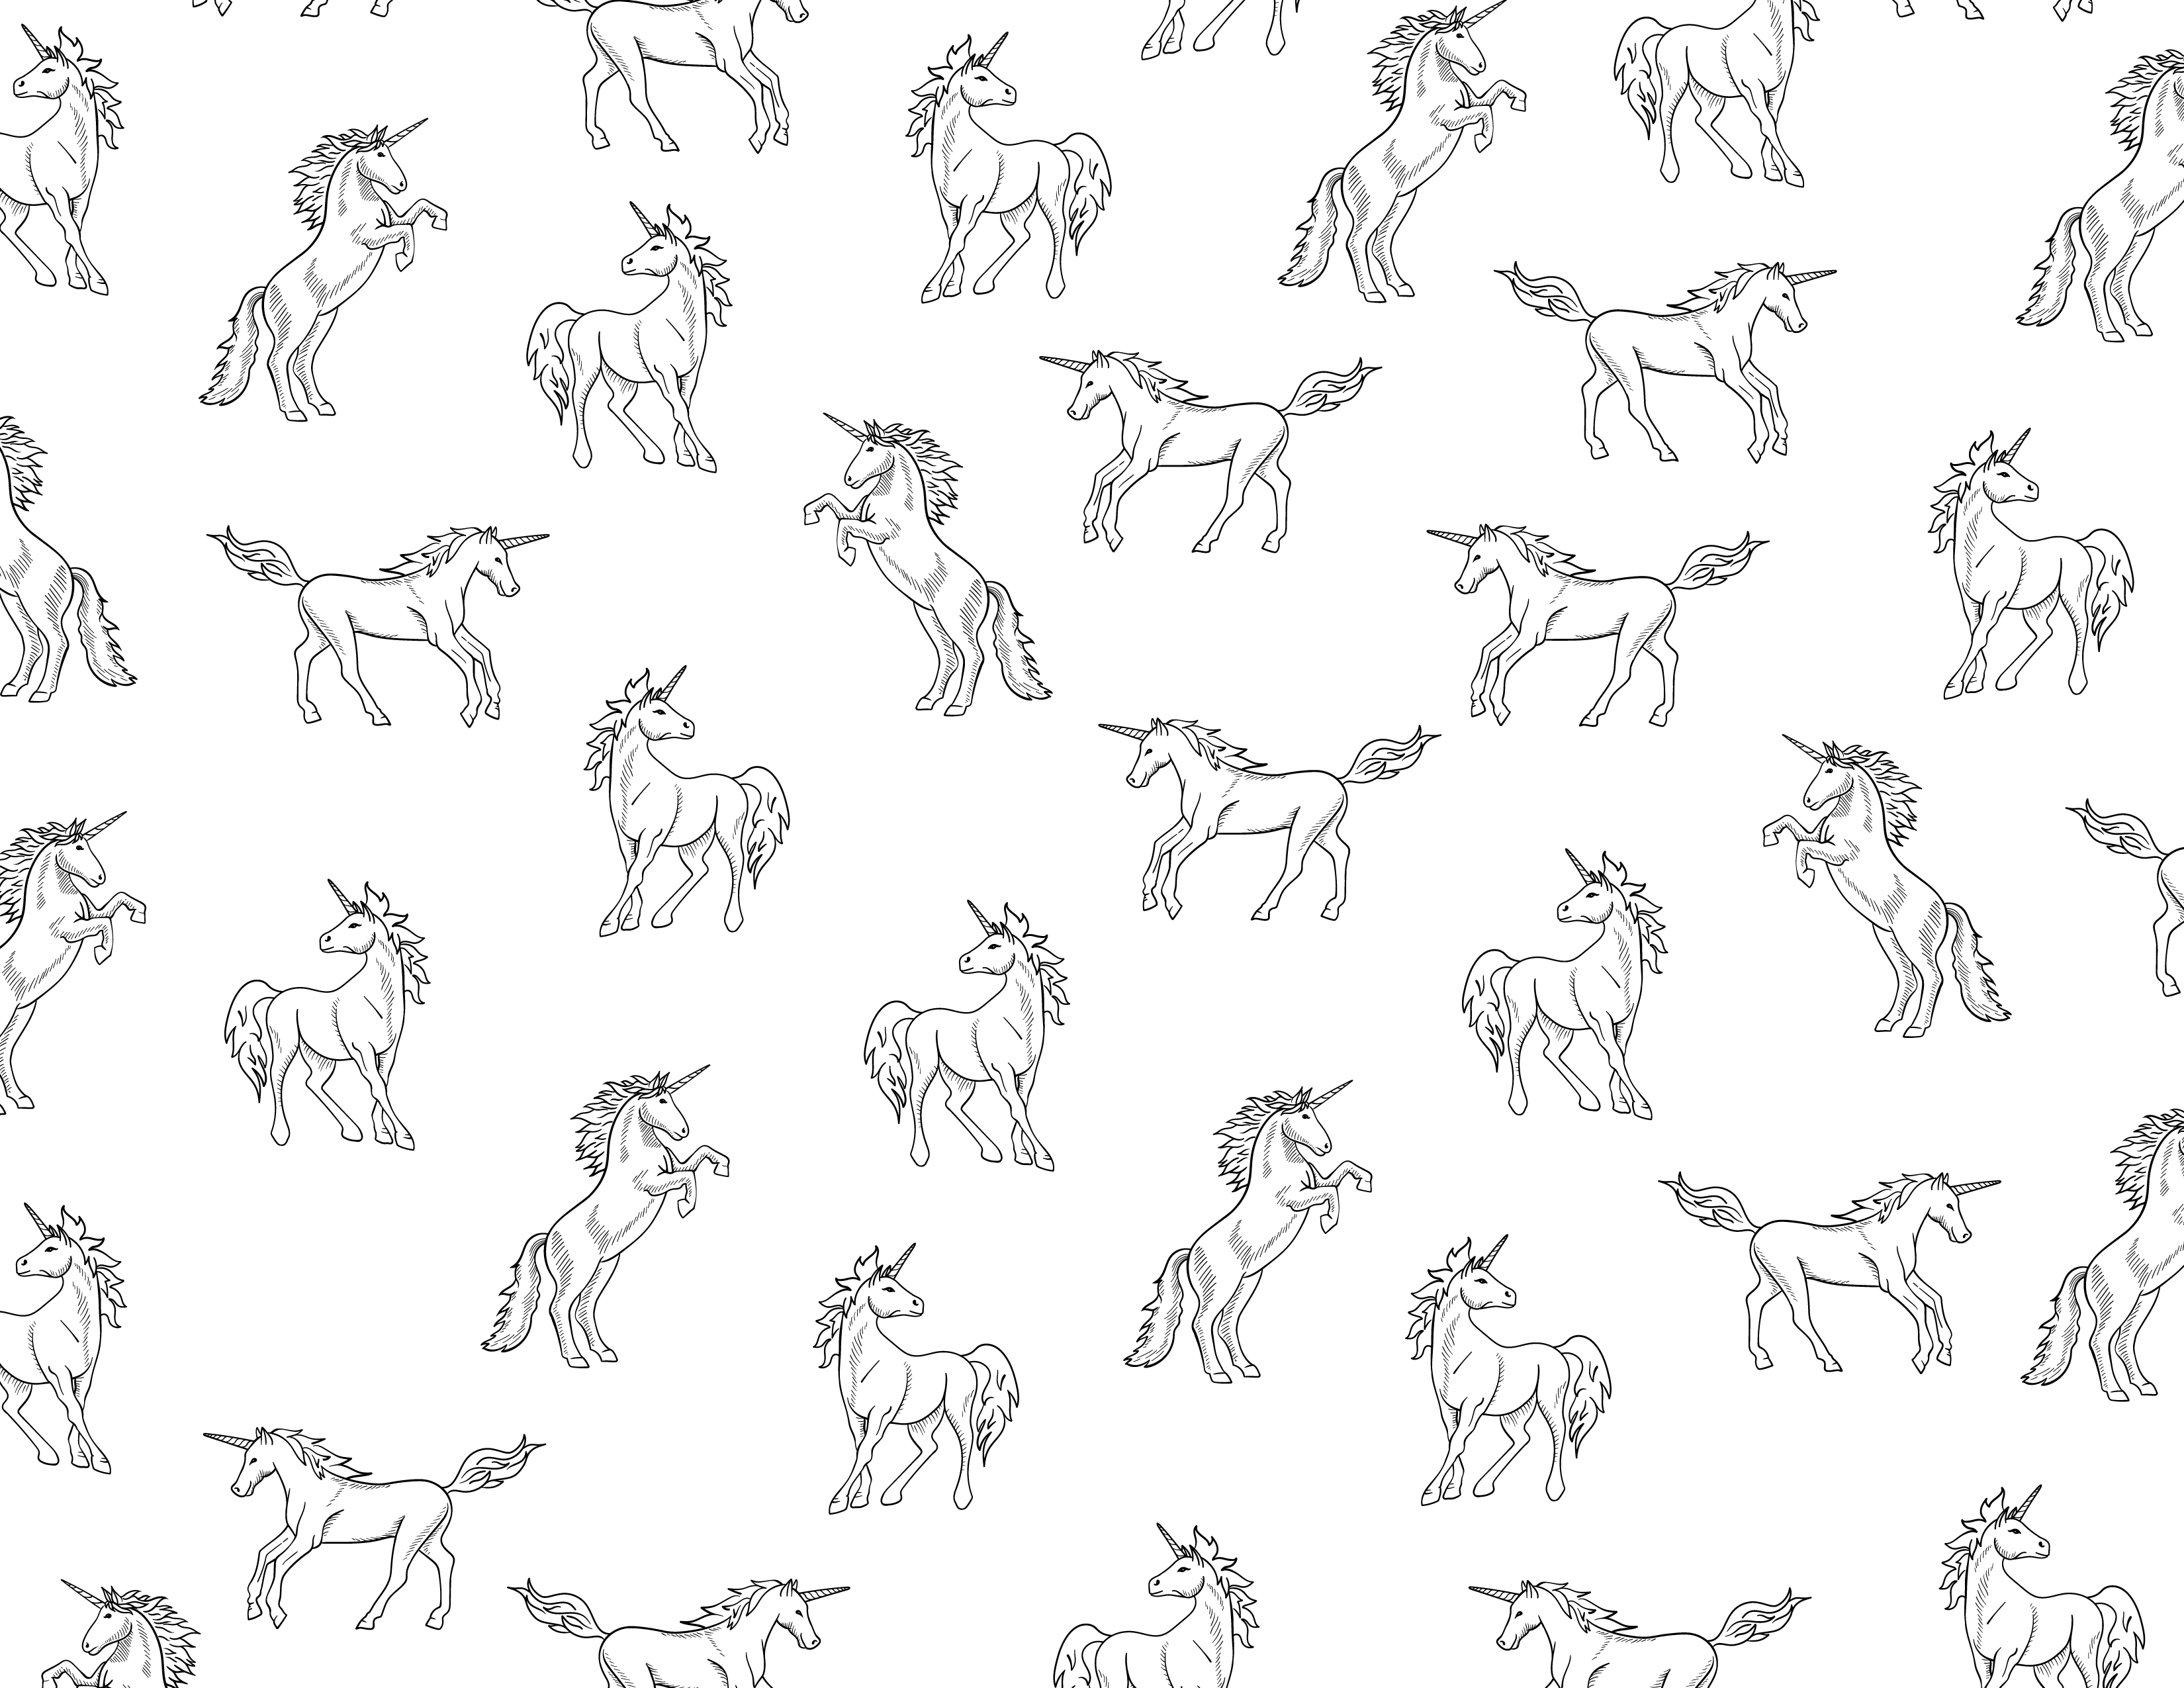 MH_Art_UnicornWhite_Bckgrd-01